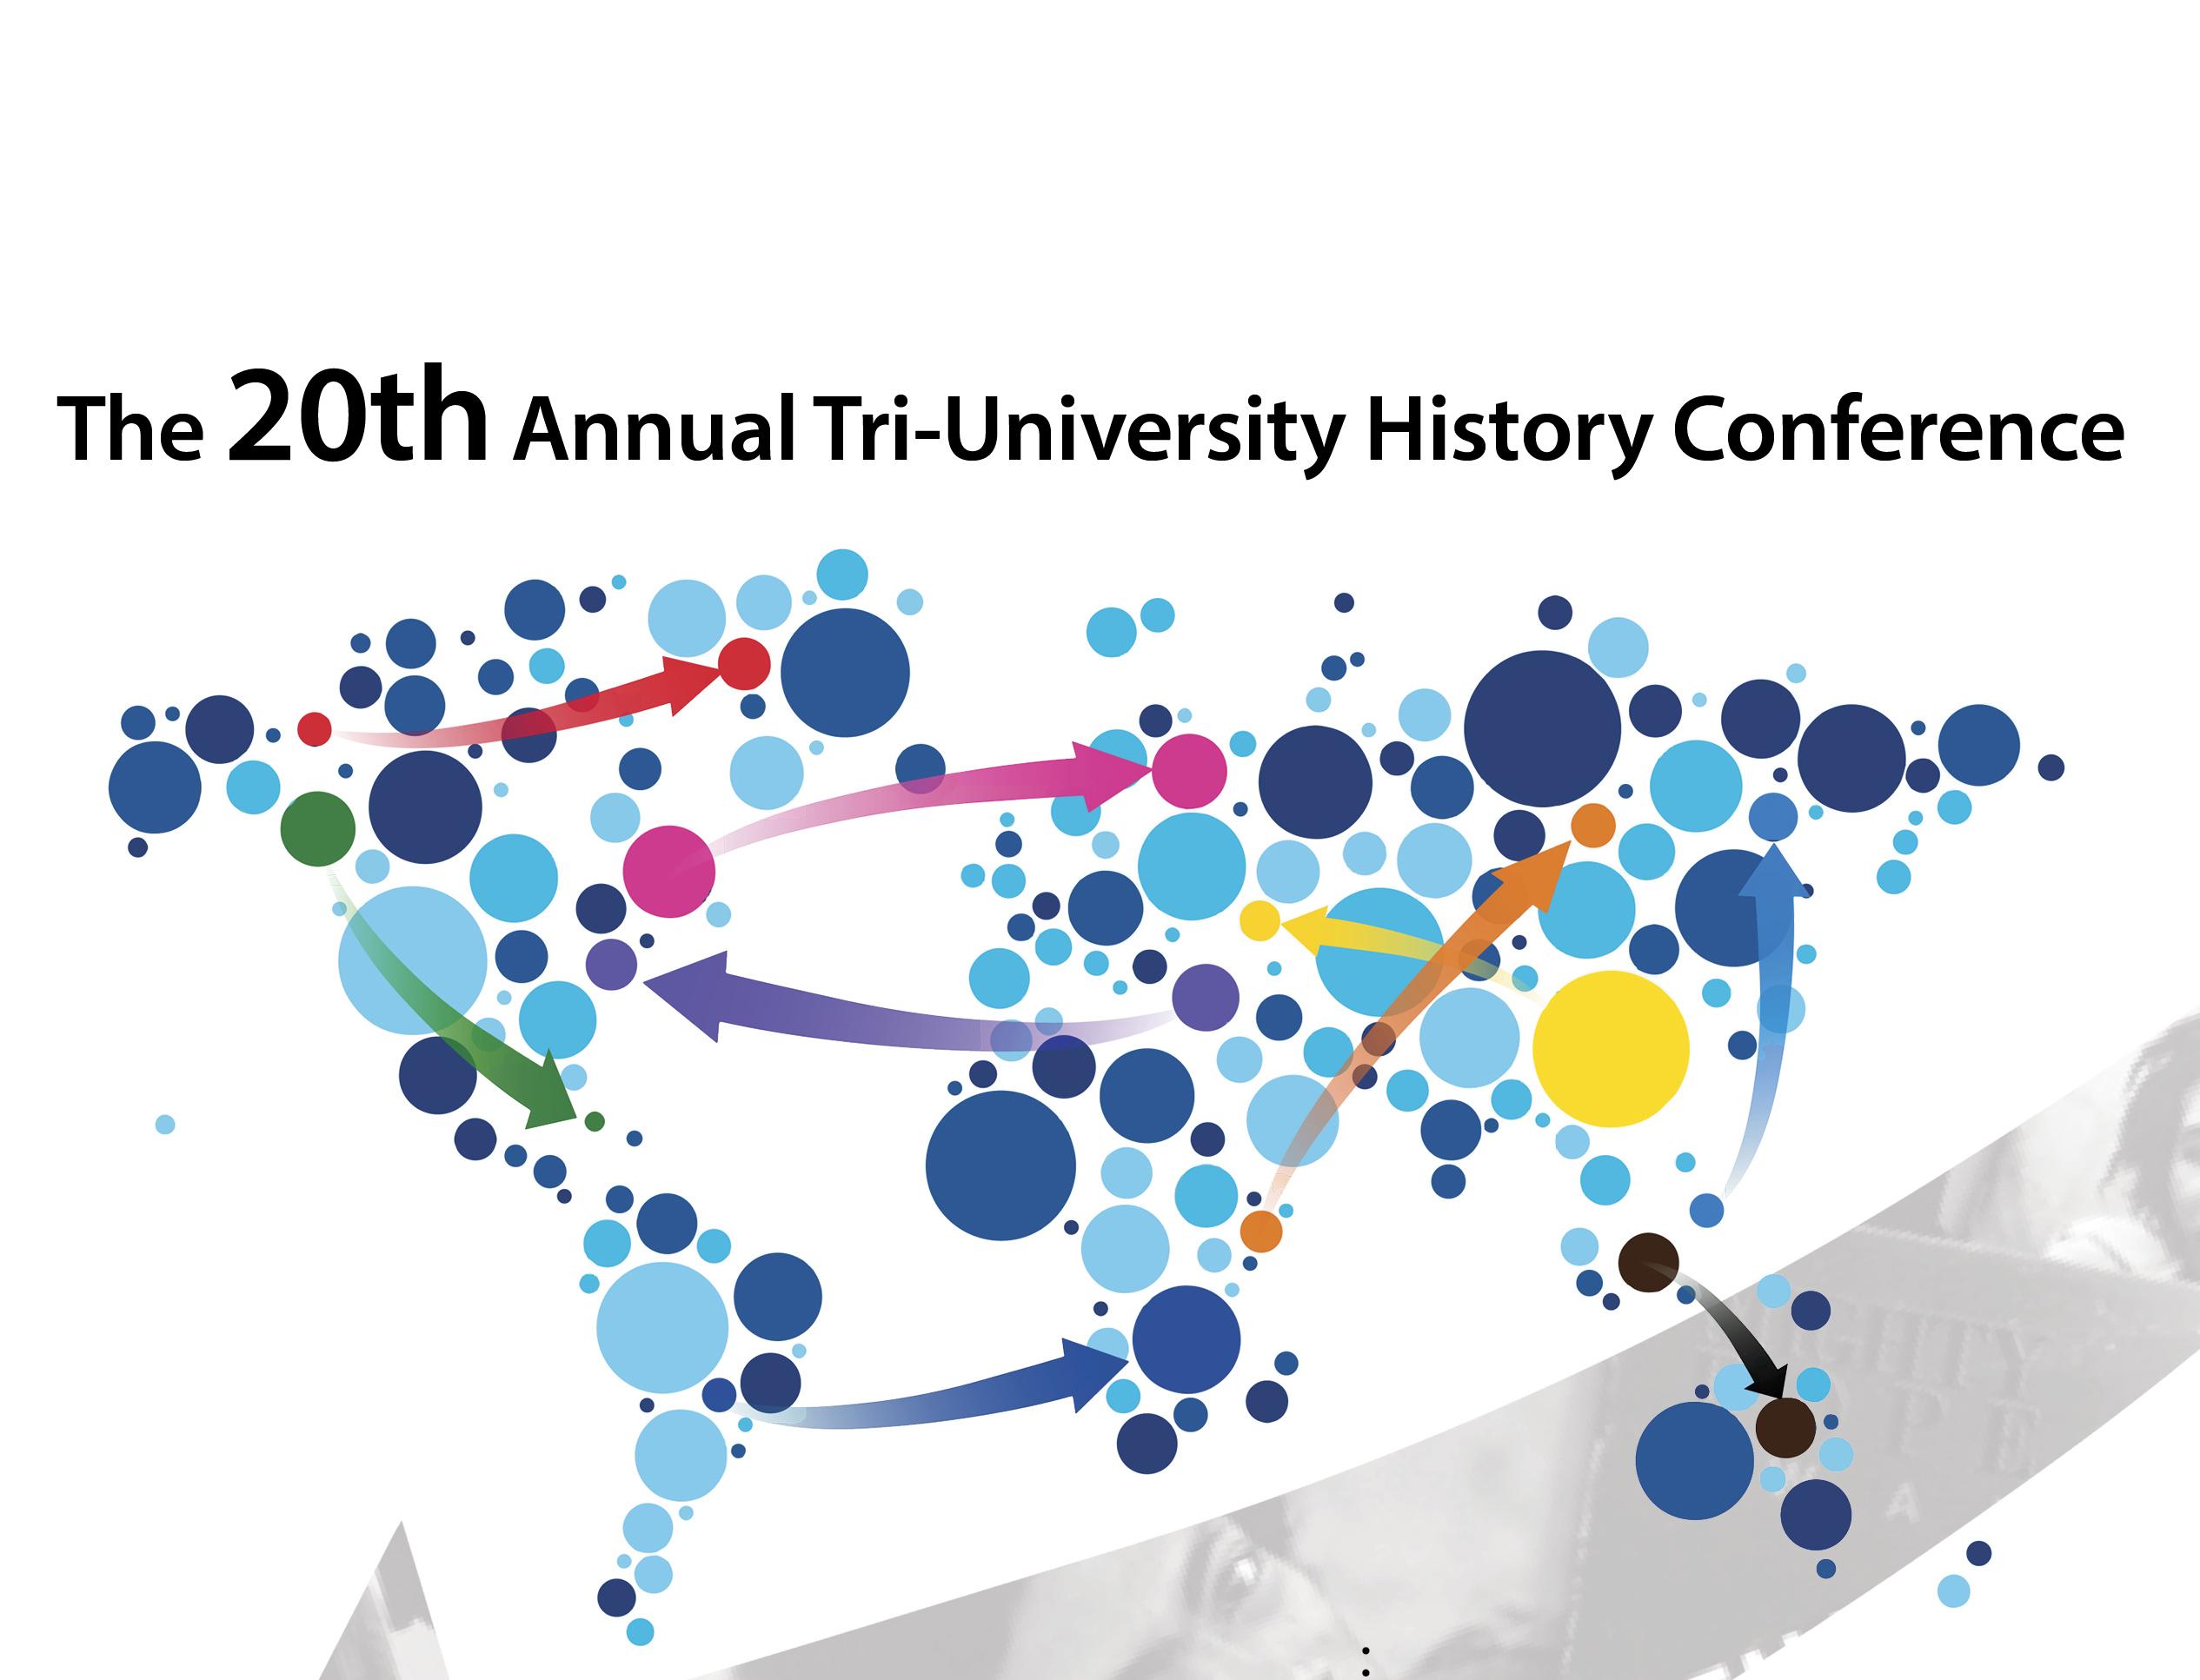 Tri-University History Conference